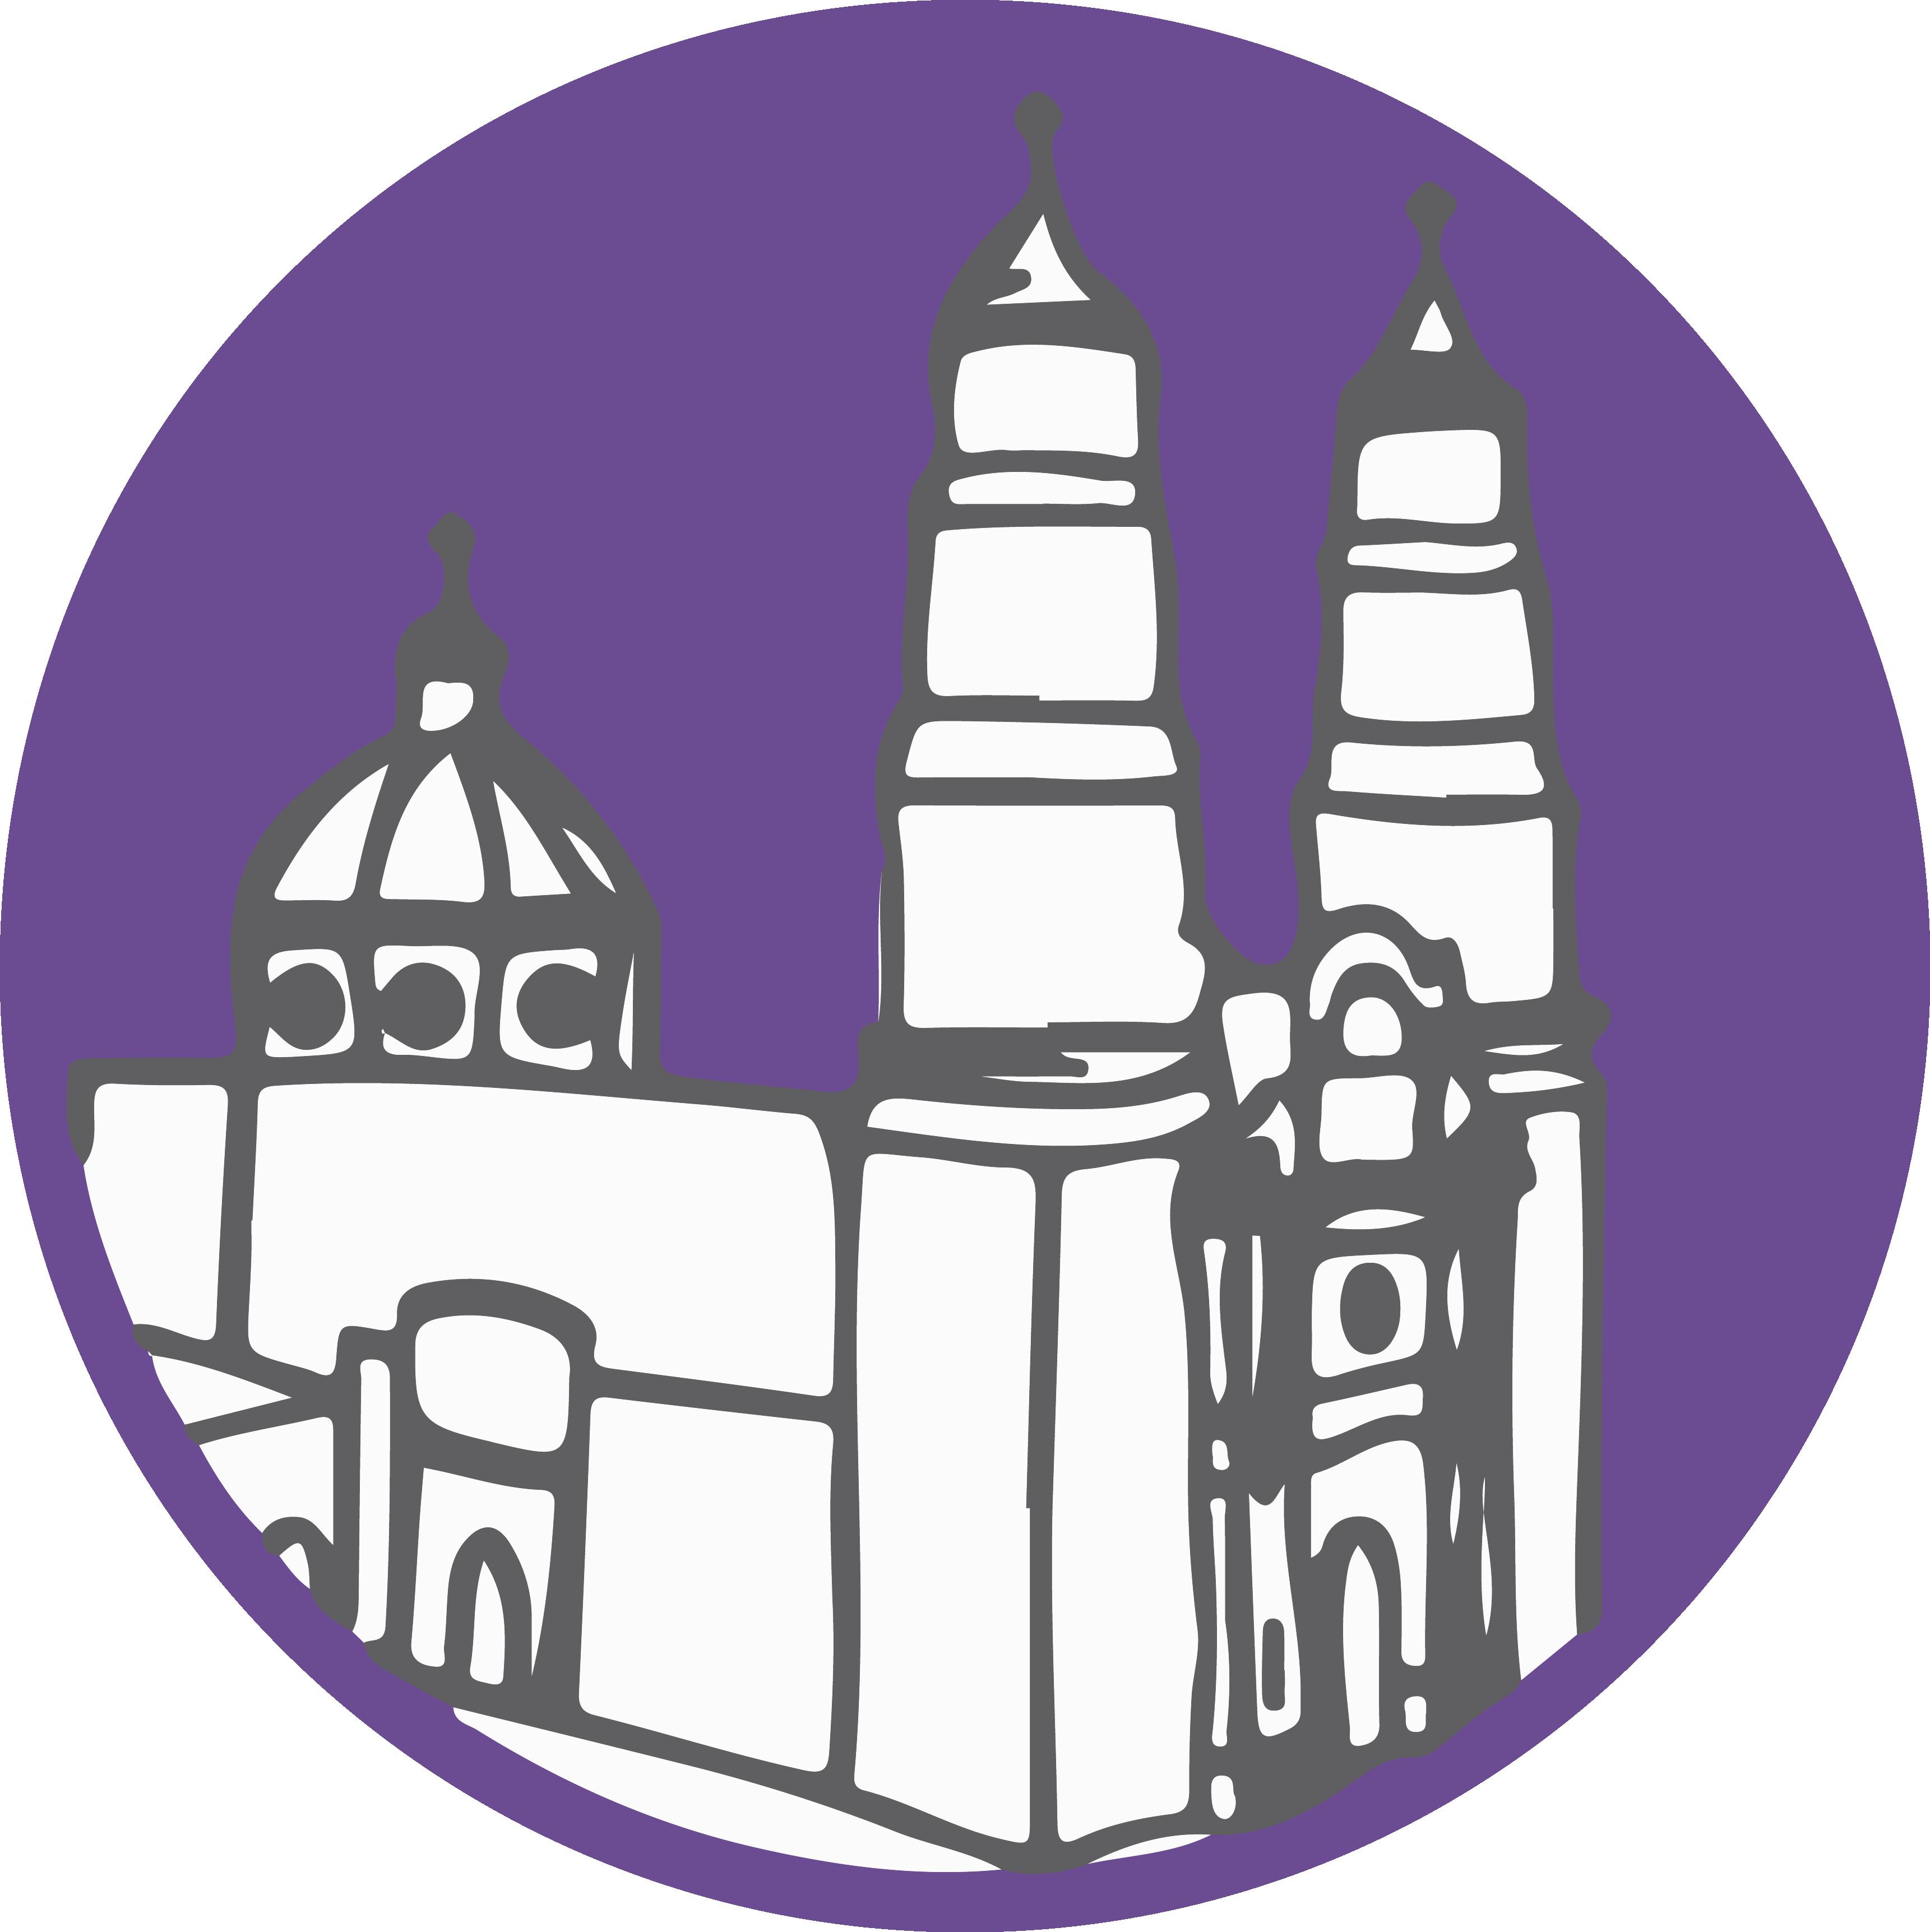 arquidiocesis